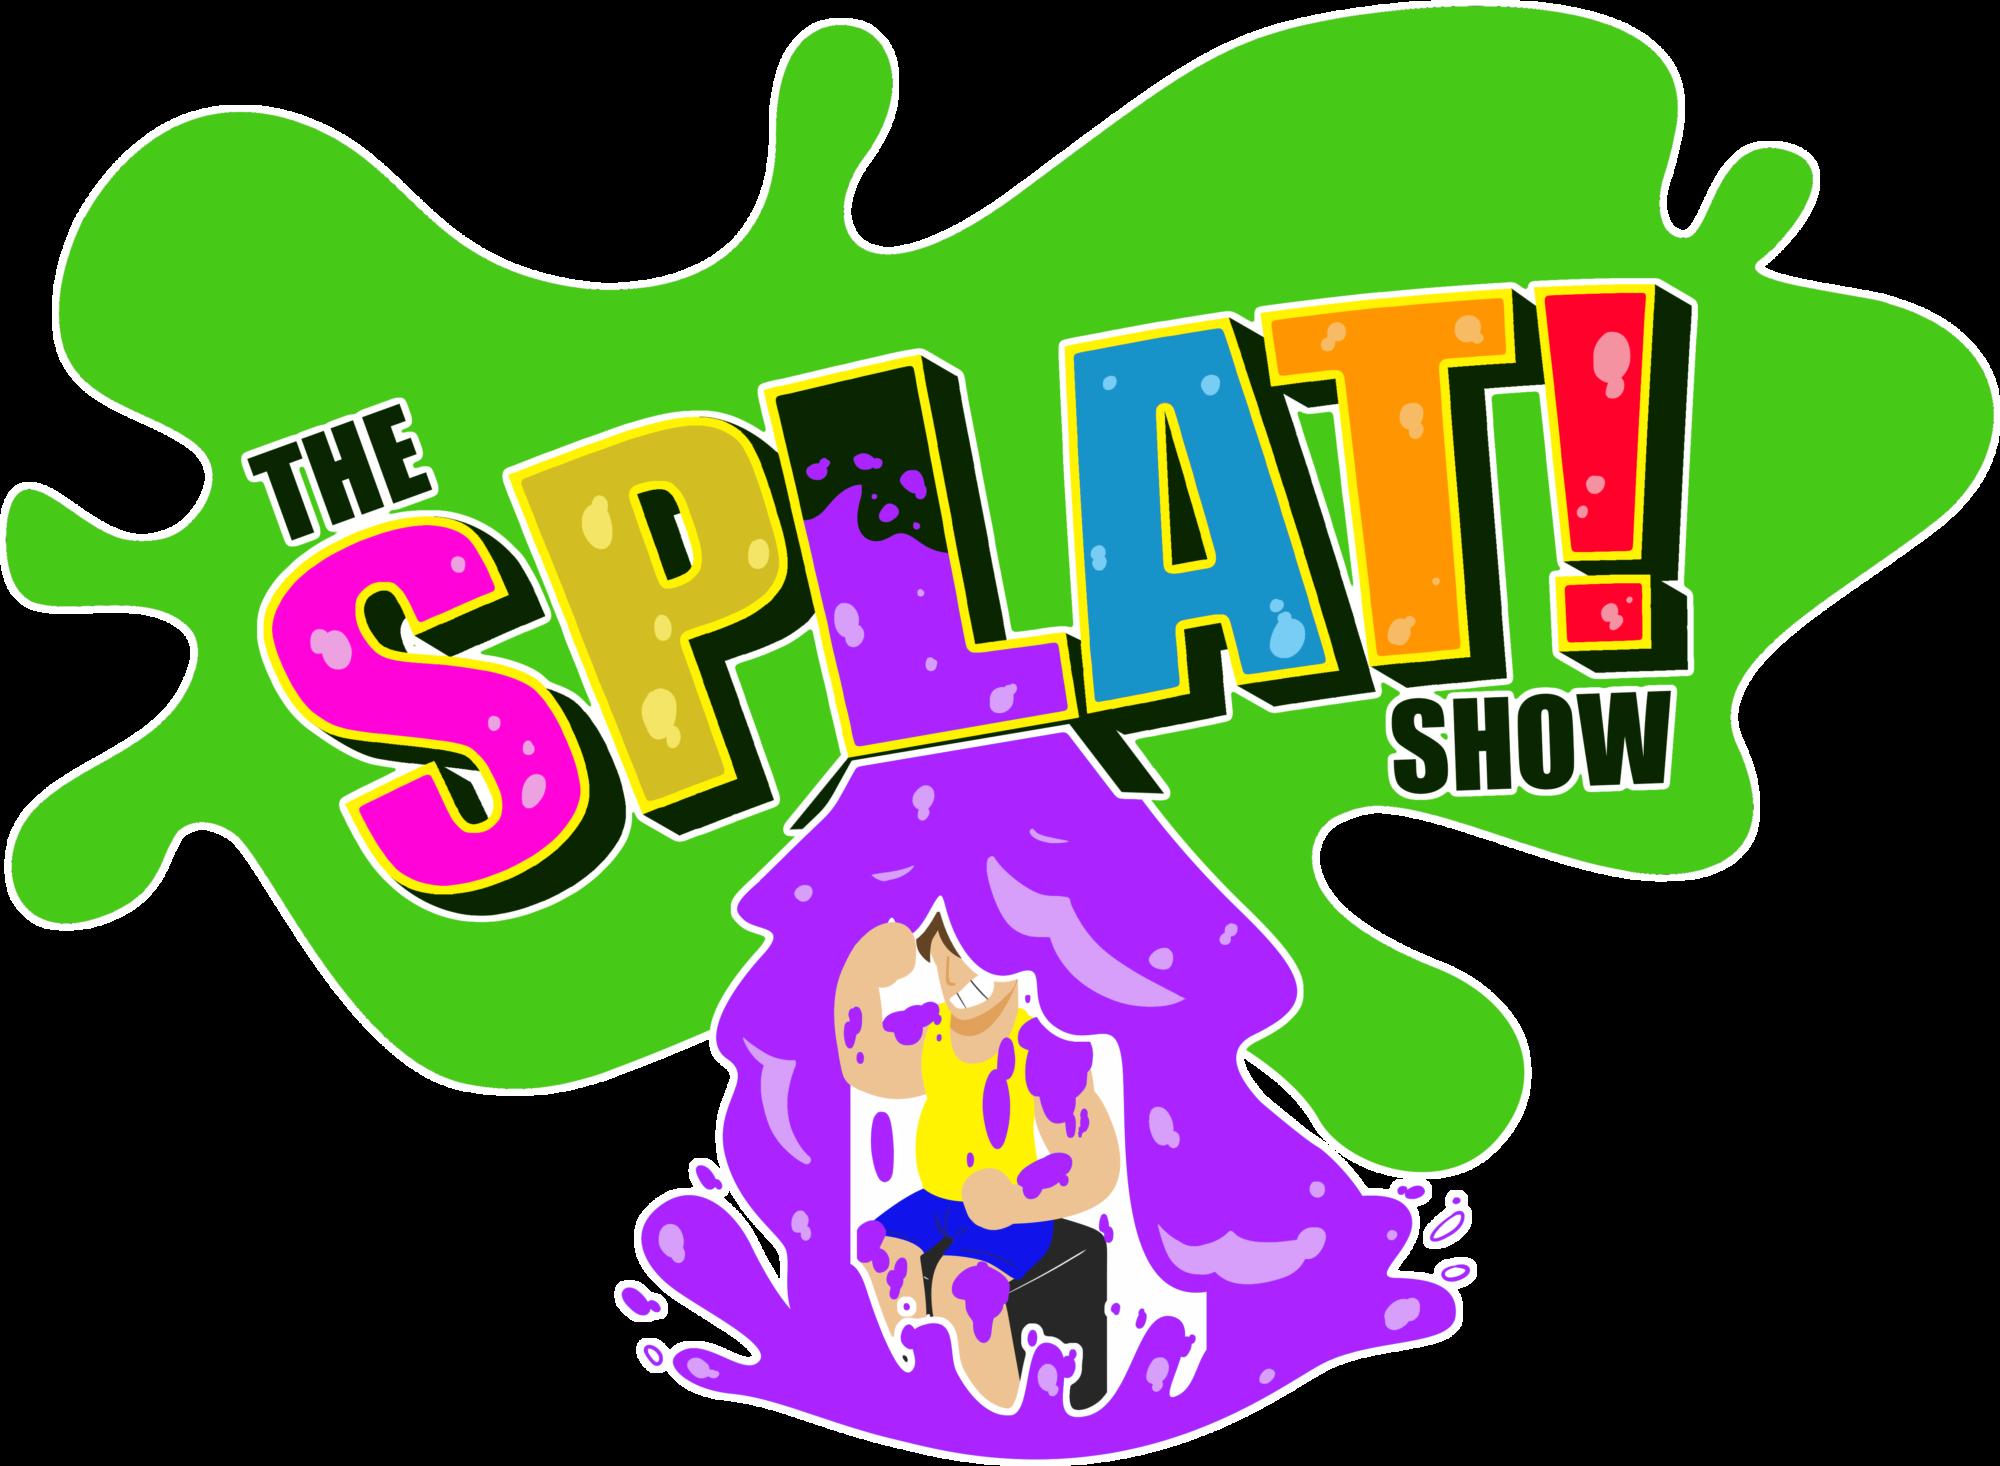 The Splat! Show